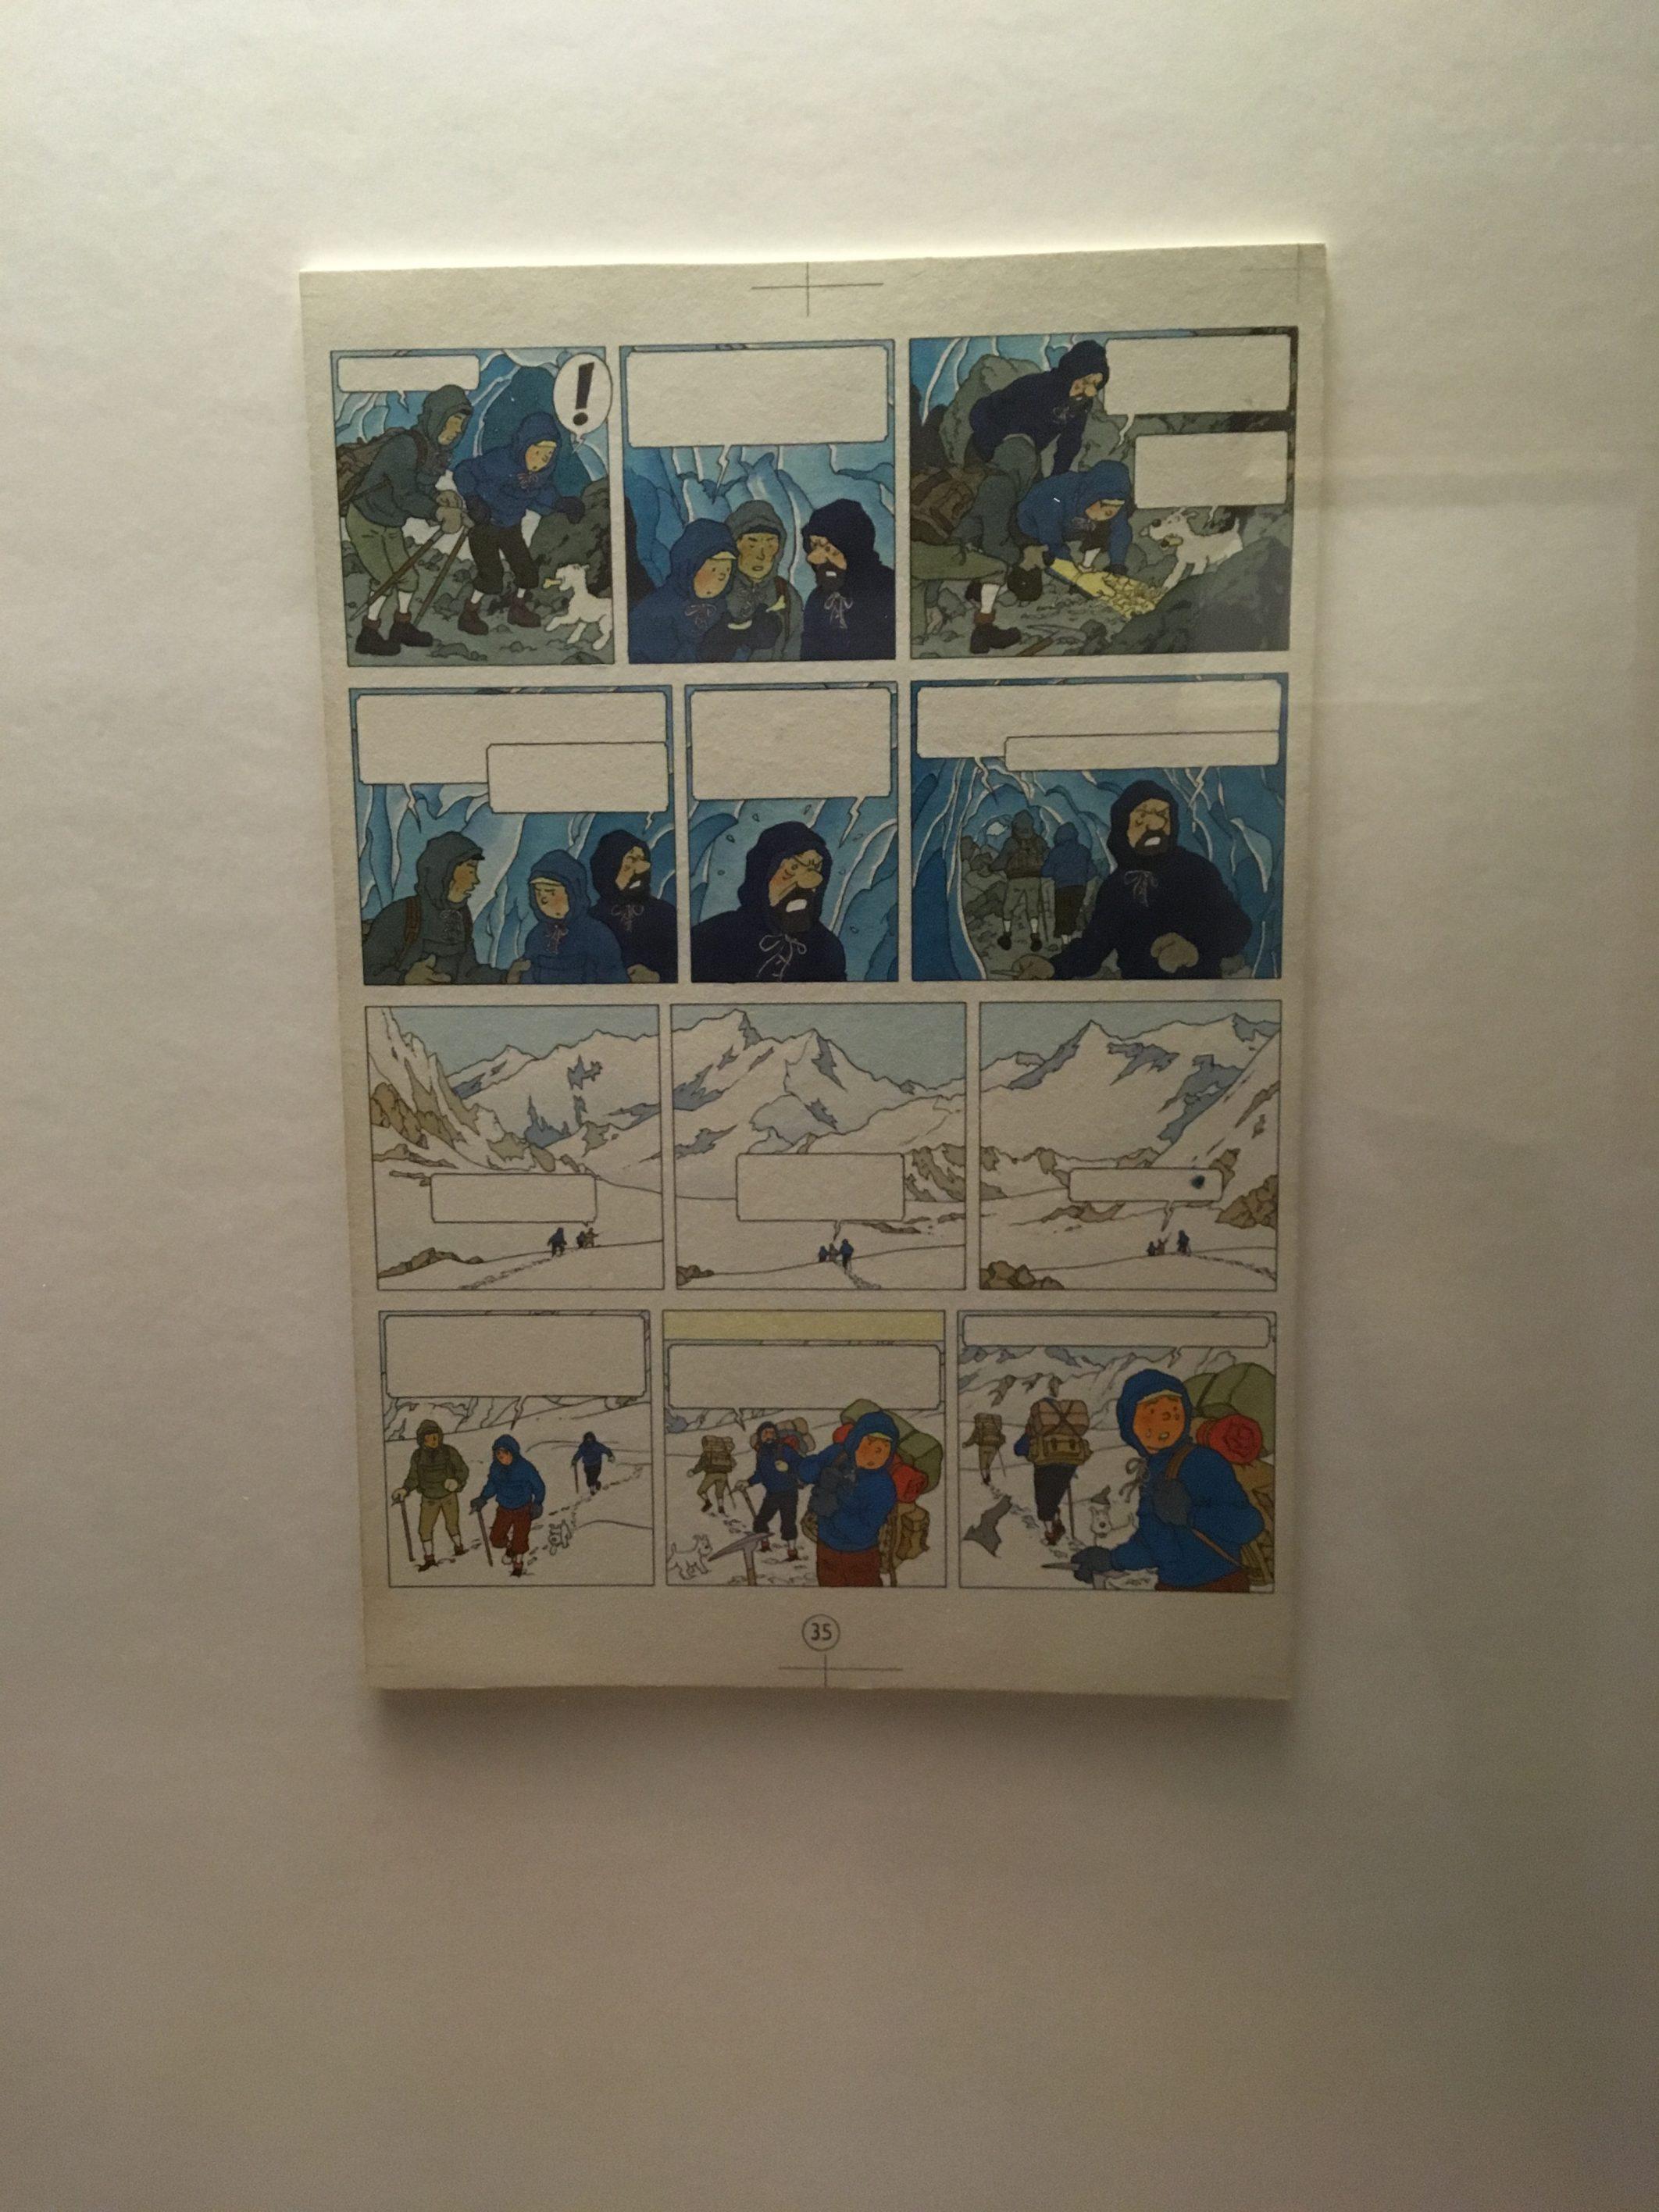 fotografia de una ilustracion original de Tintin de Herge